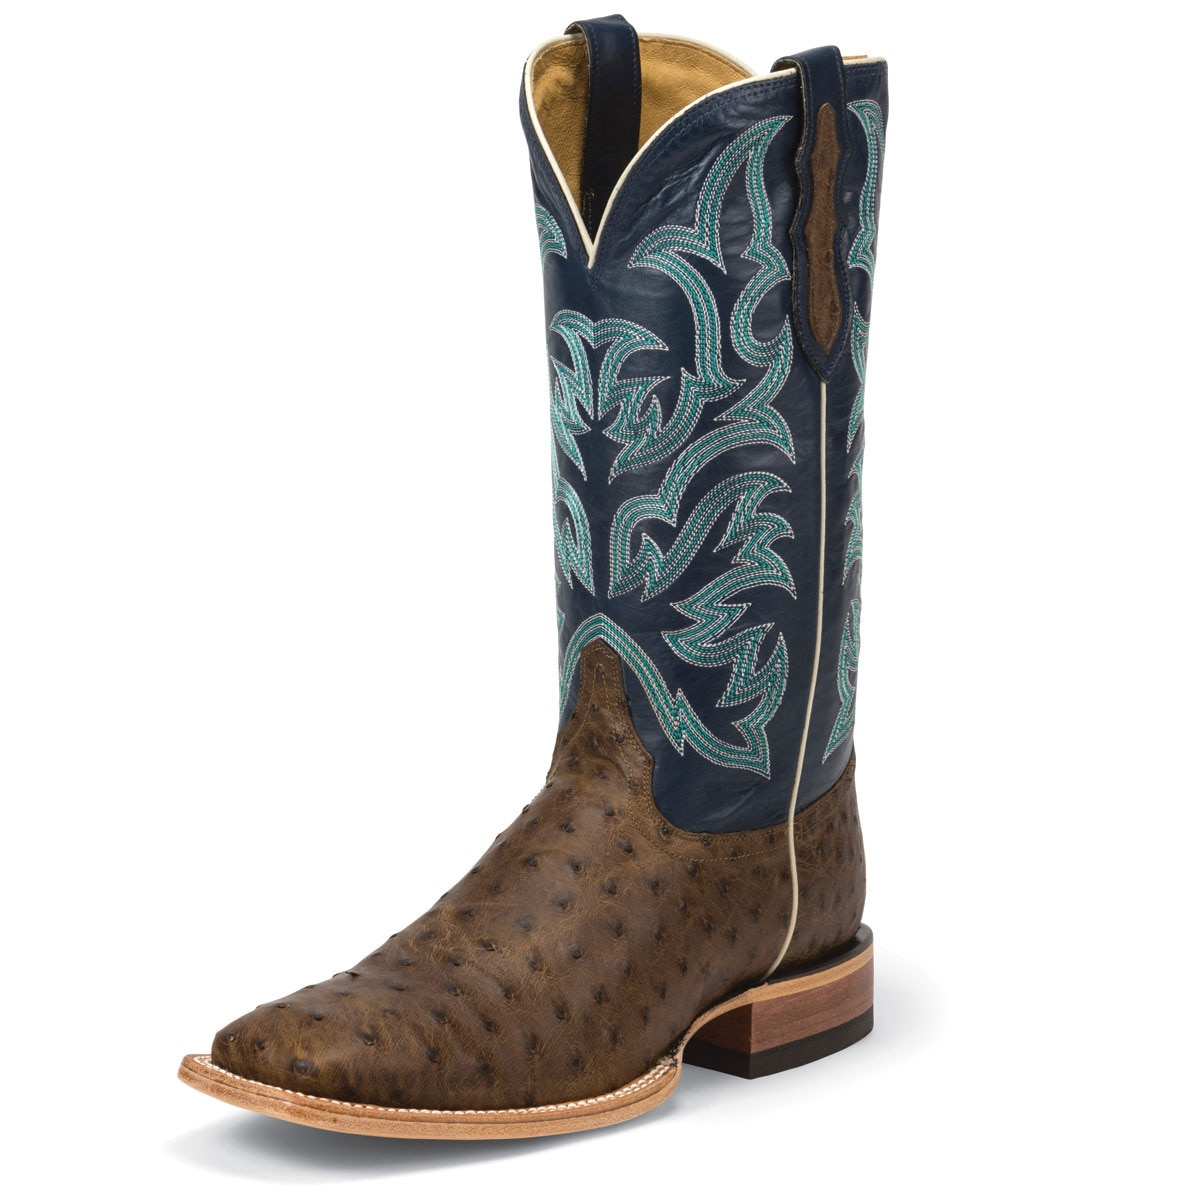 Justin Men's AQHA Ostrich Remuda Boots- Closeout!